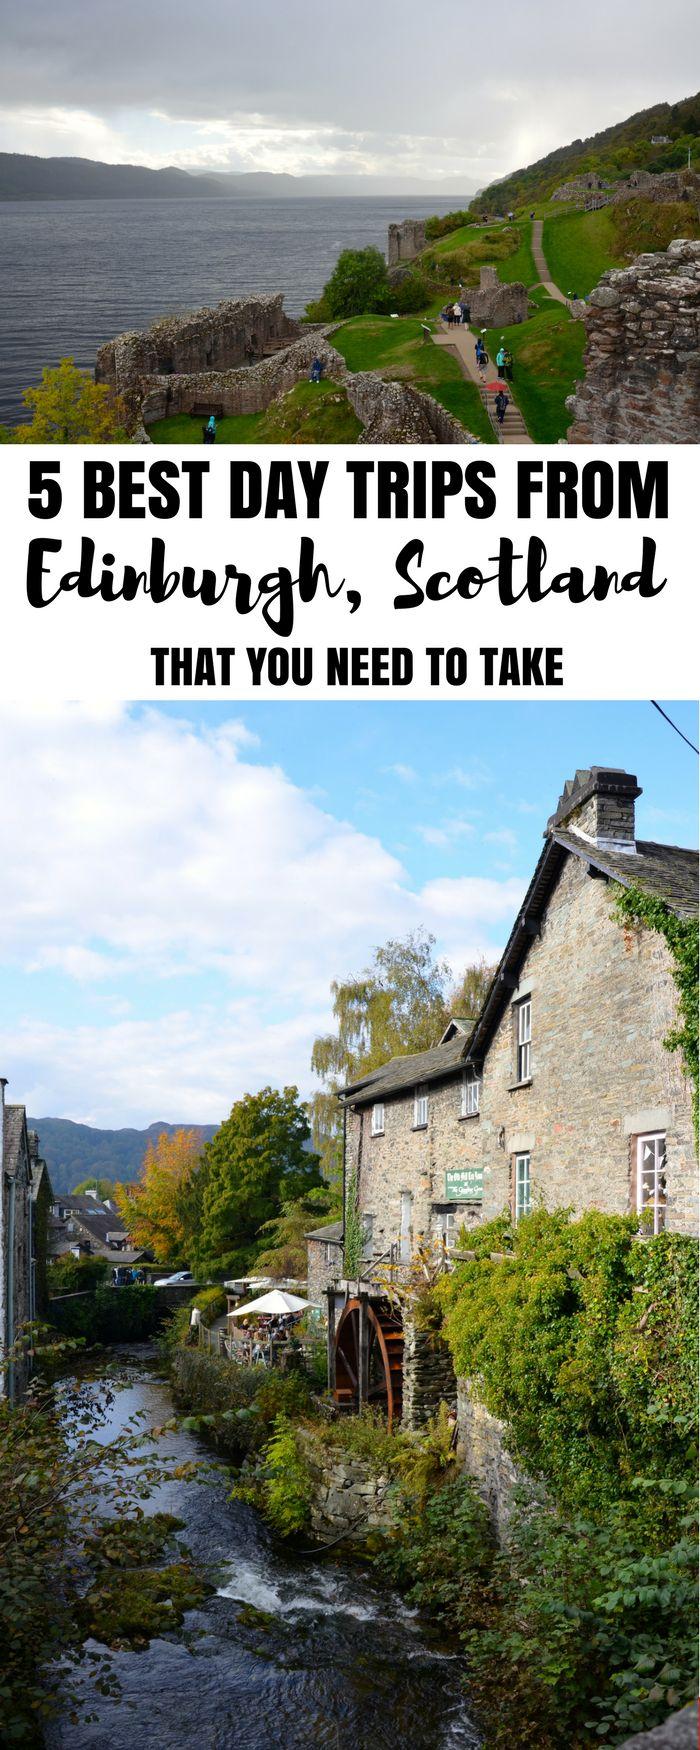 Best tours in Edinburgh, best day trips from Edinburgh, Scotland. Edinburgh day trips!